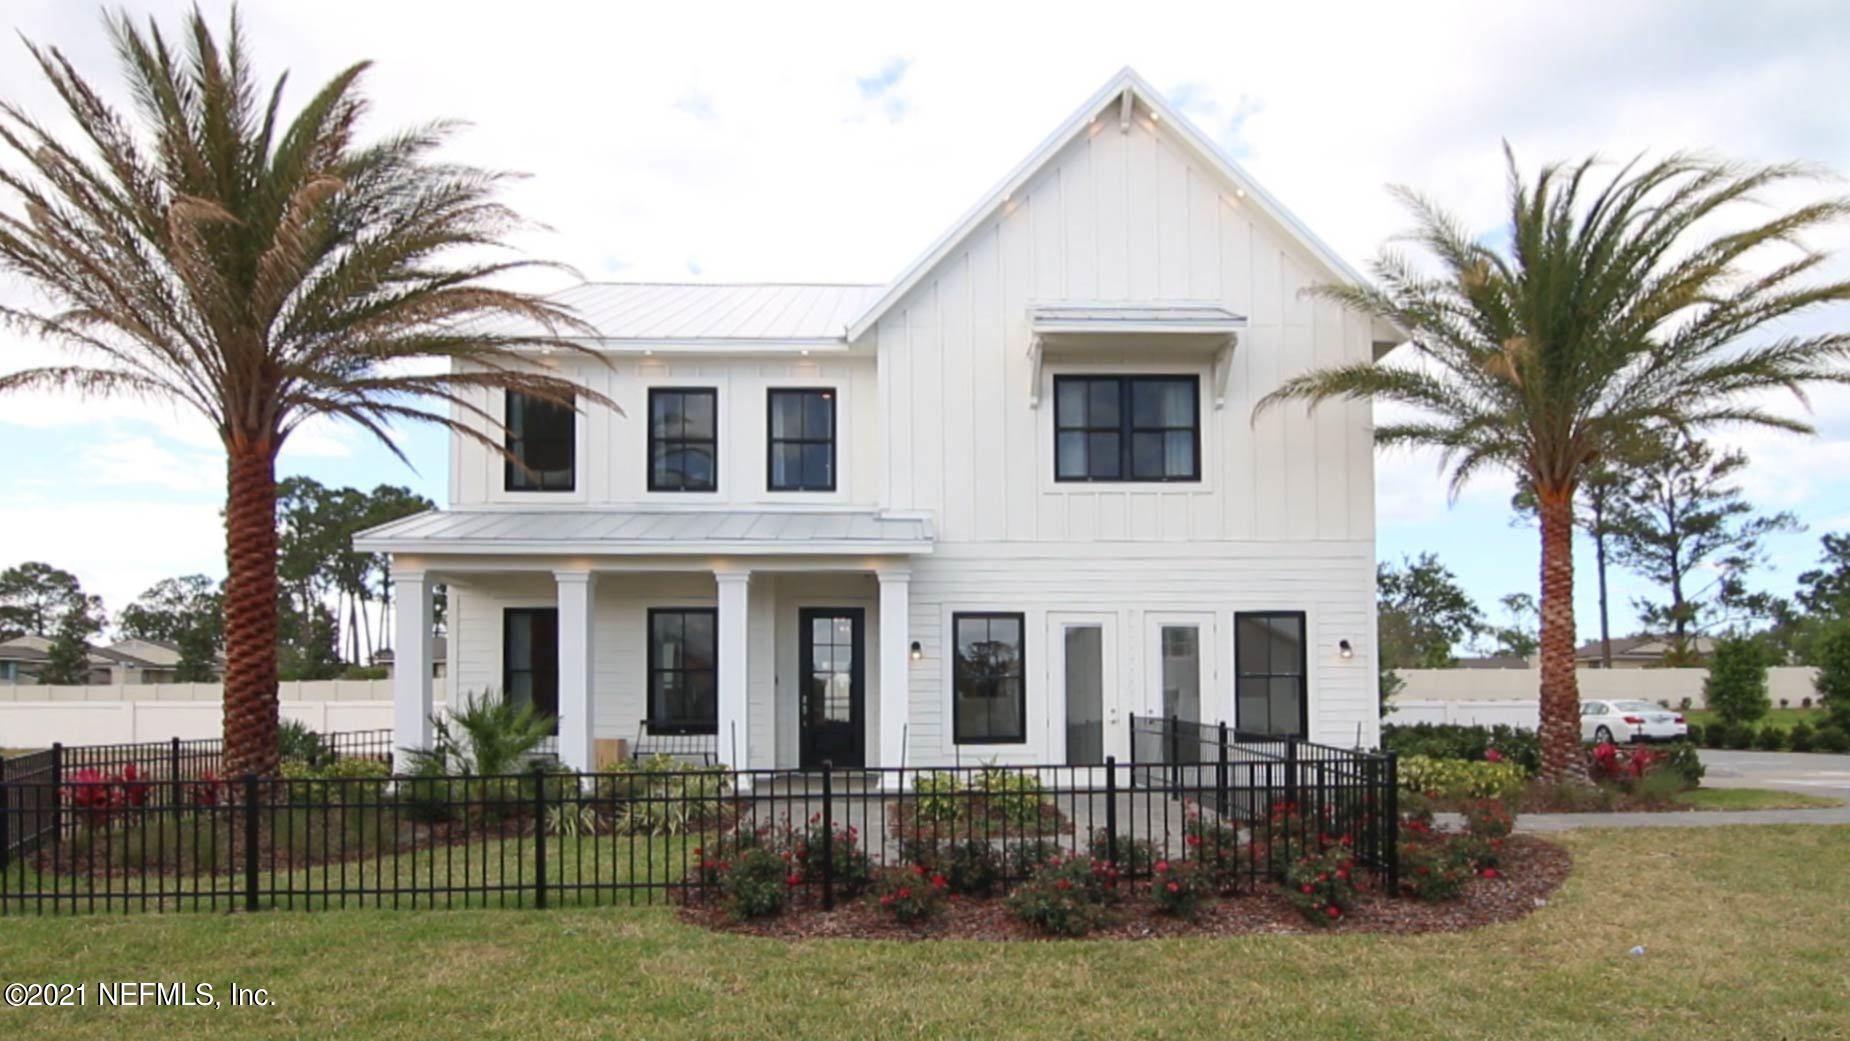 32 WHATLEY LN #Lot No: 002, Ponte Vedra Beach, FL 32082 - MLS#: 1103310